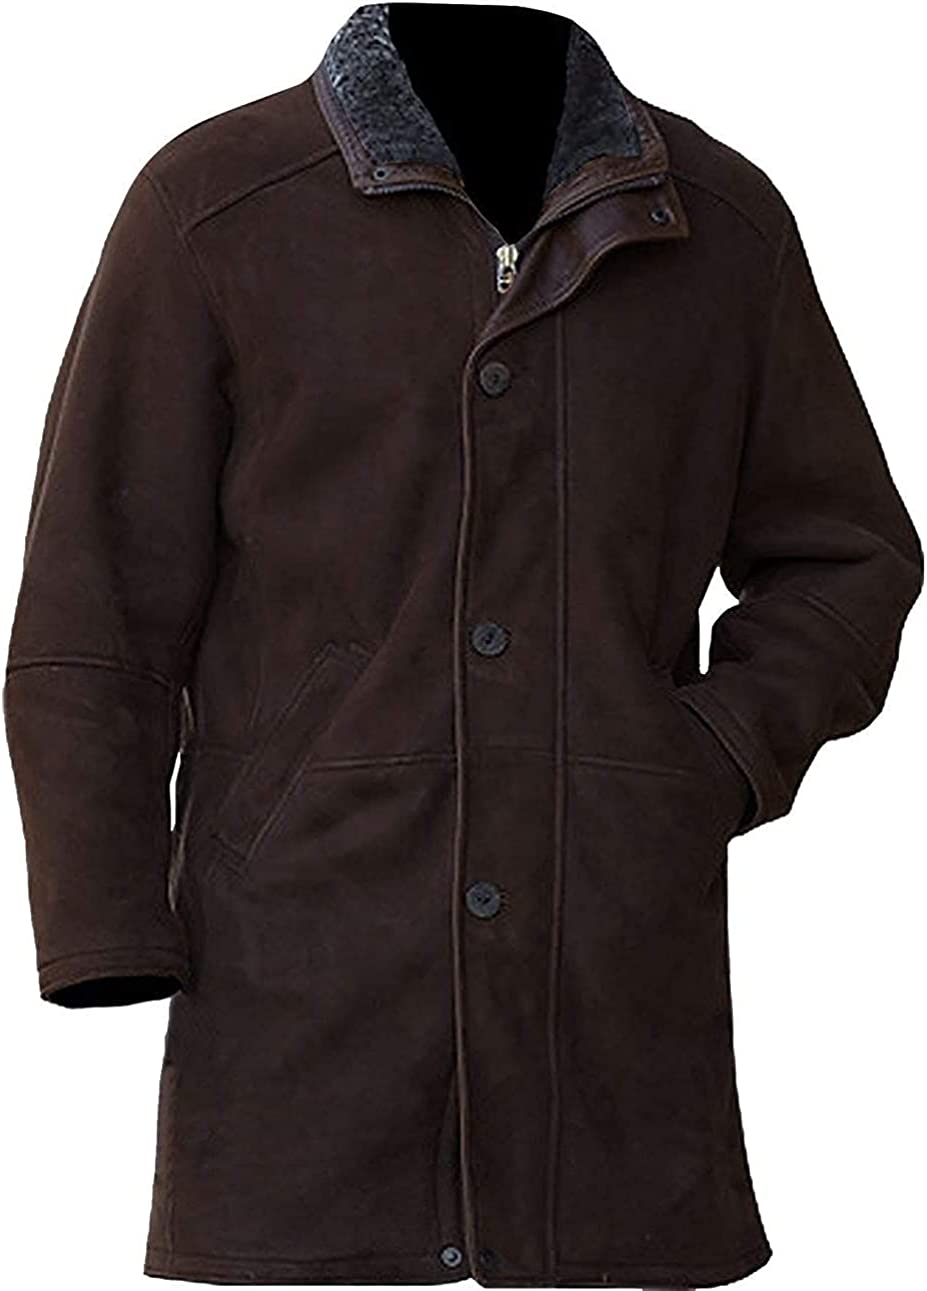 UGFashions Men's Robert Mire Sheriff Suede Leather Dark Brown Jacket Trench Coat